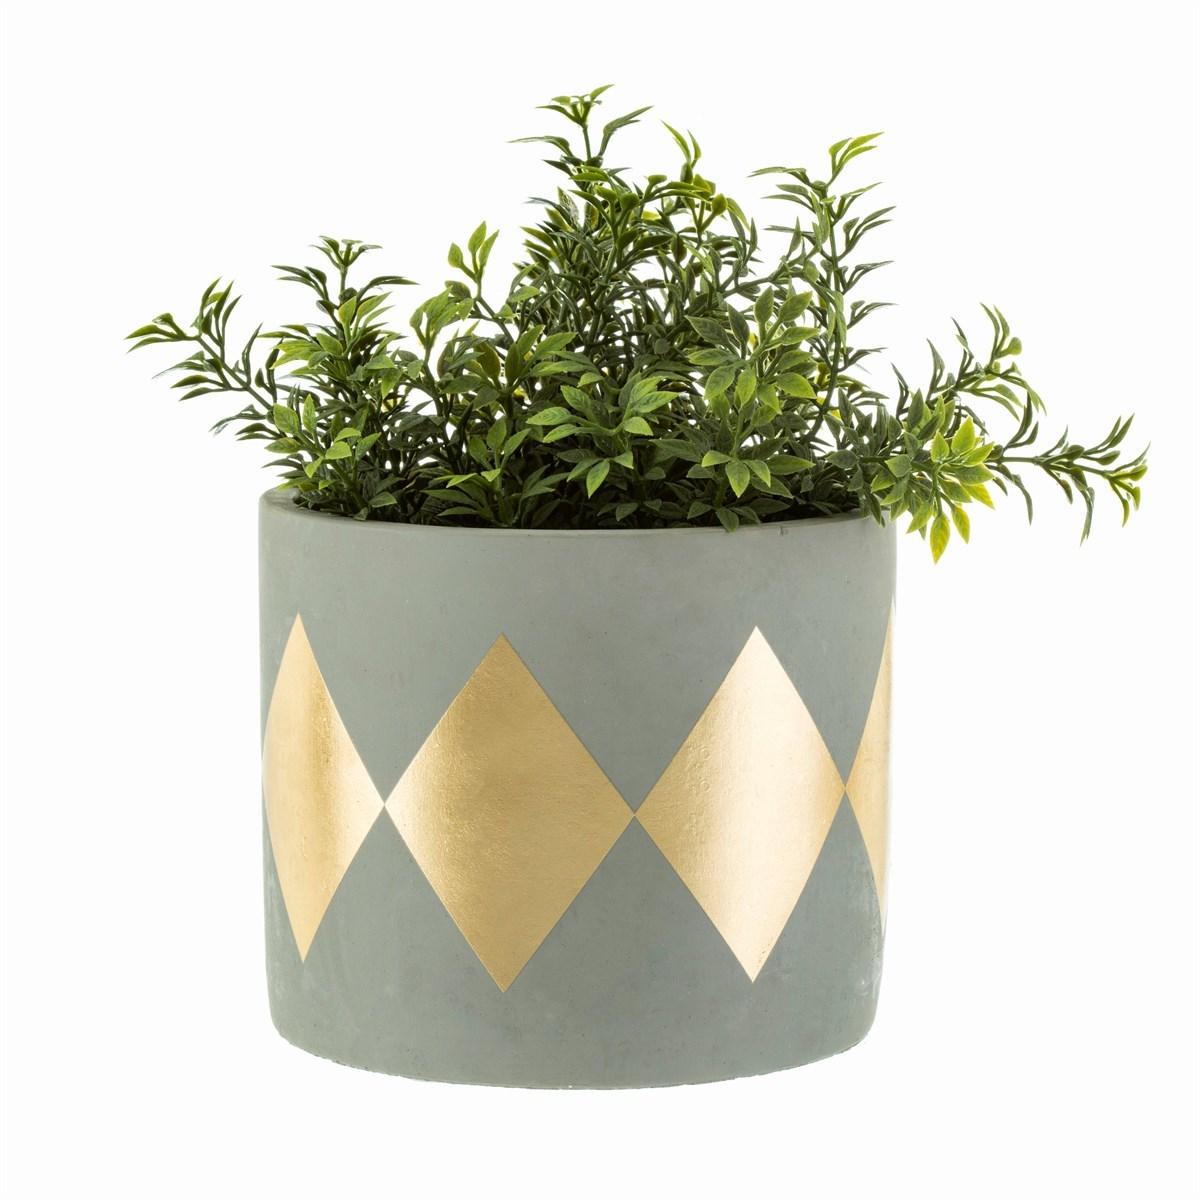 Sass & Belle: Cement Planter image